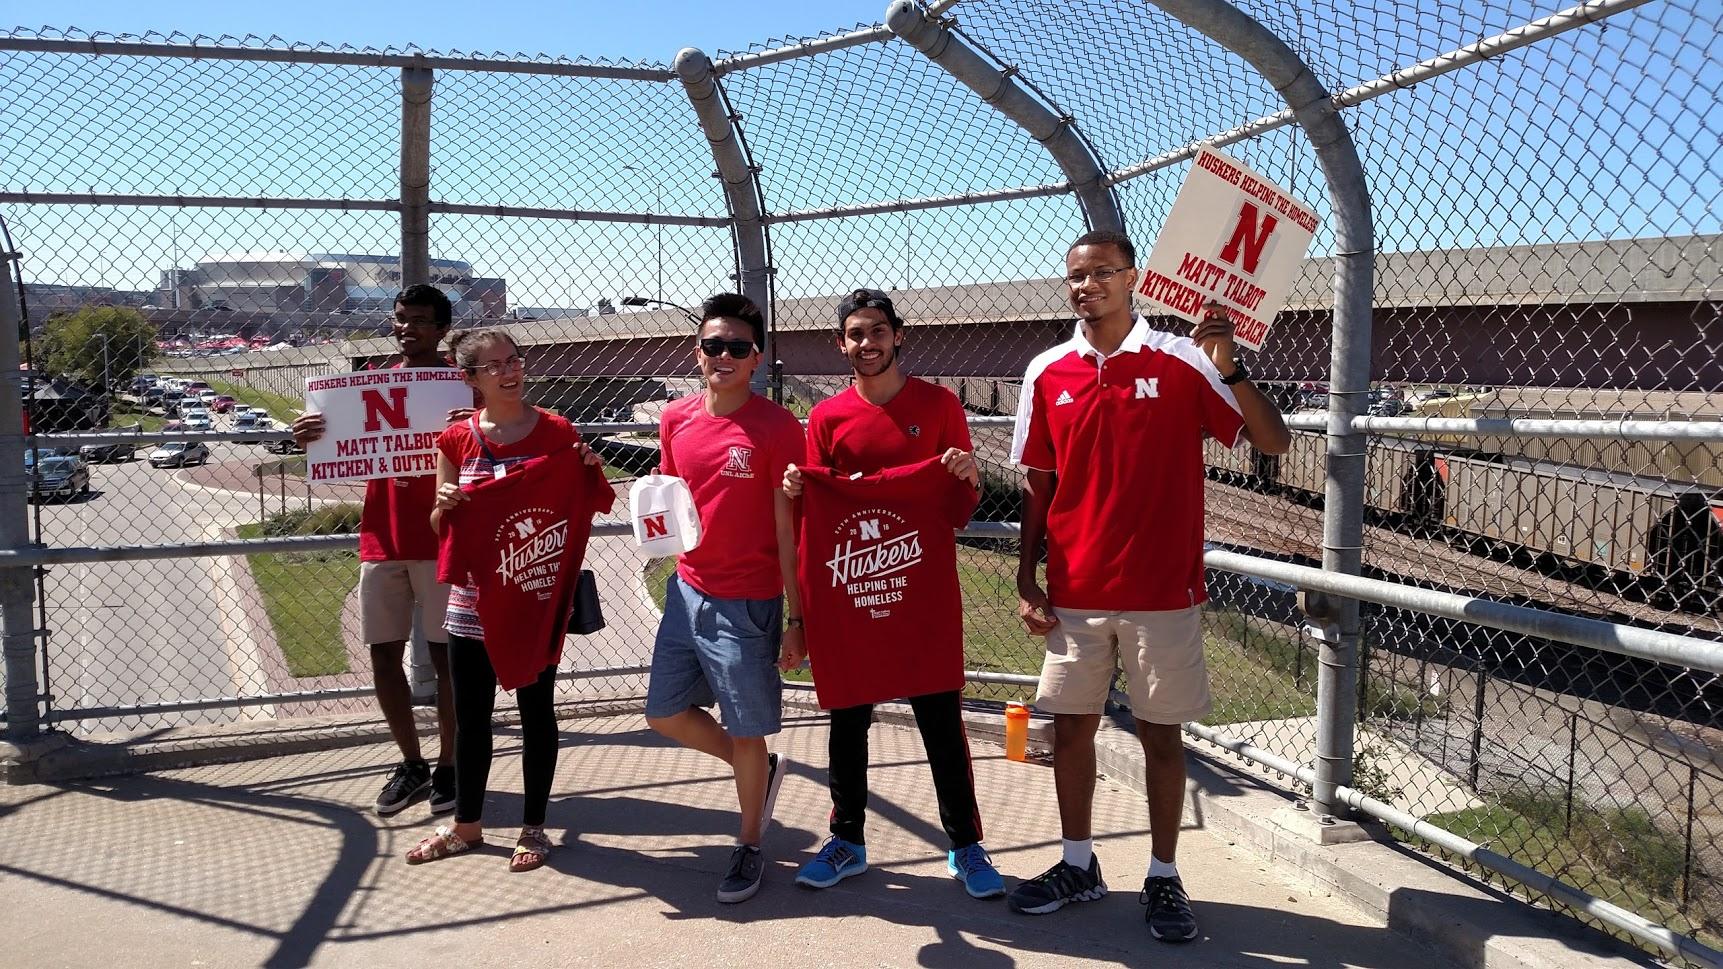 TBP members and initiates raising money